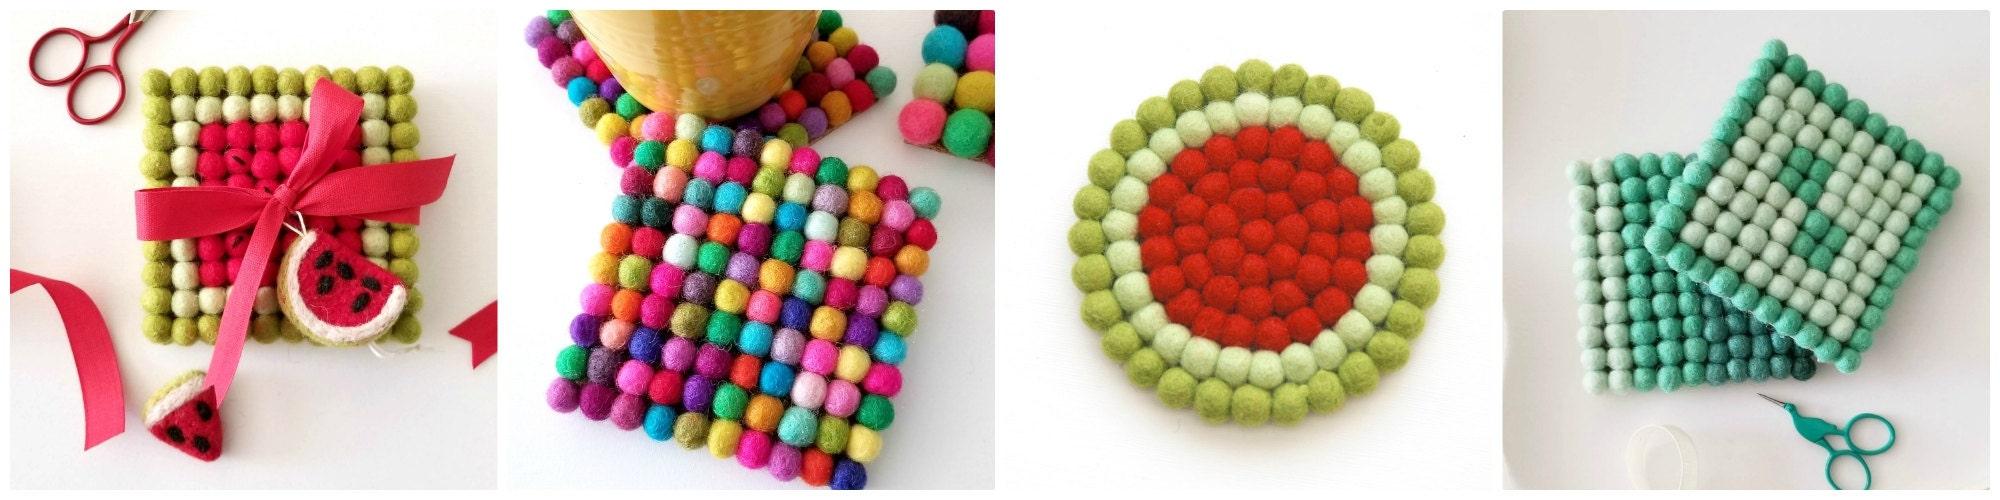 Felt Ball Coasters - Handmade